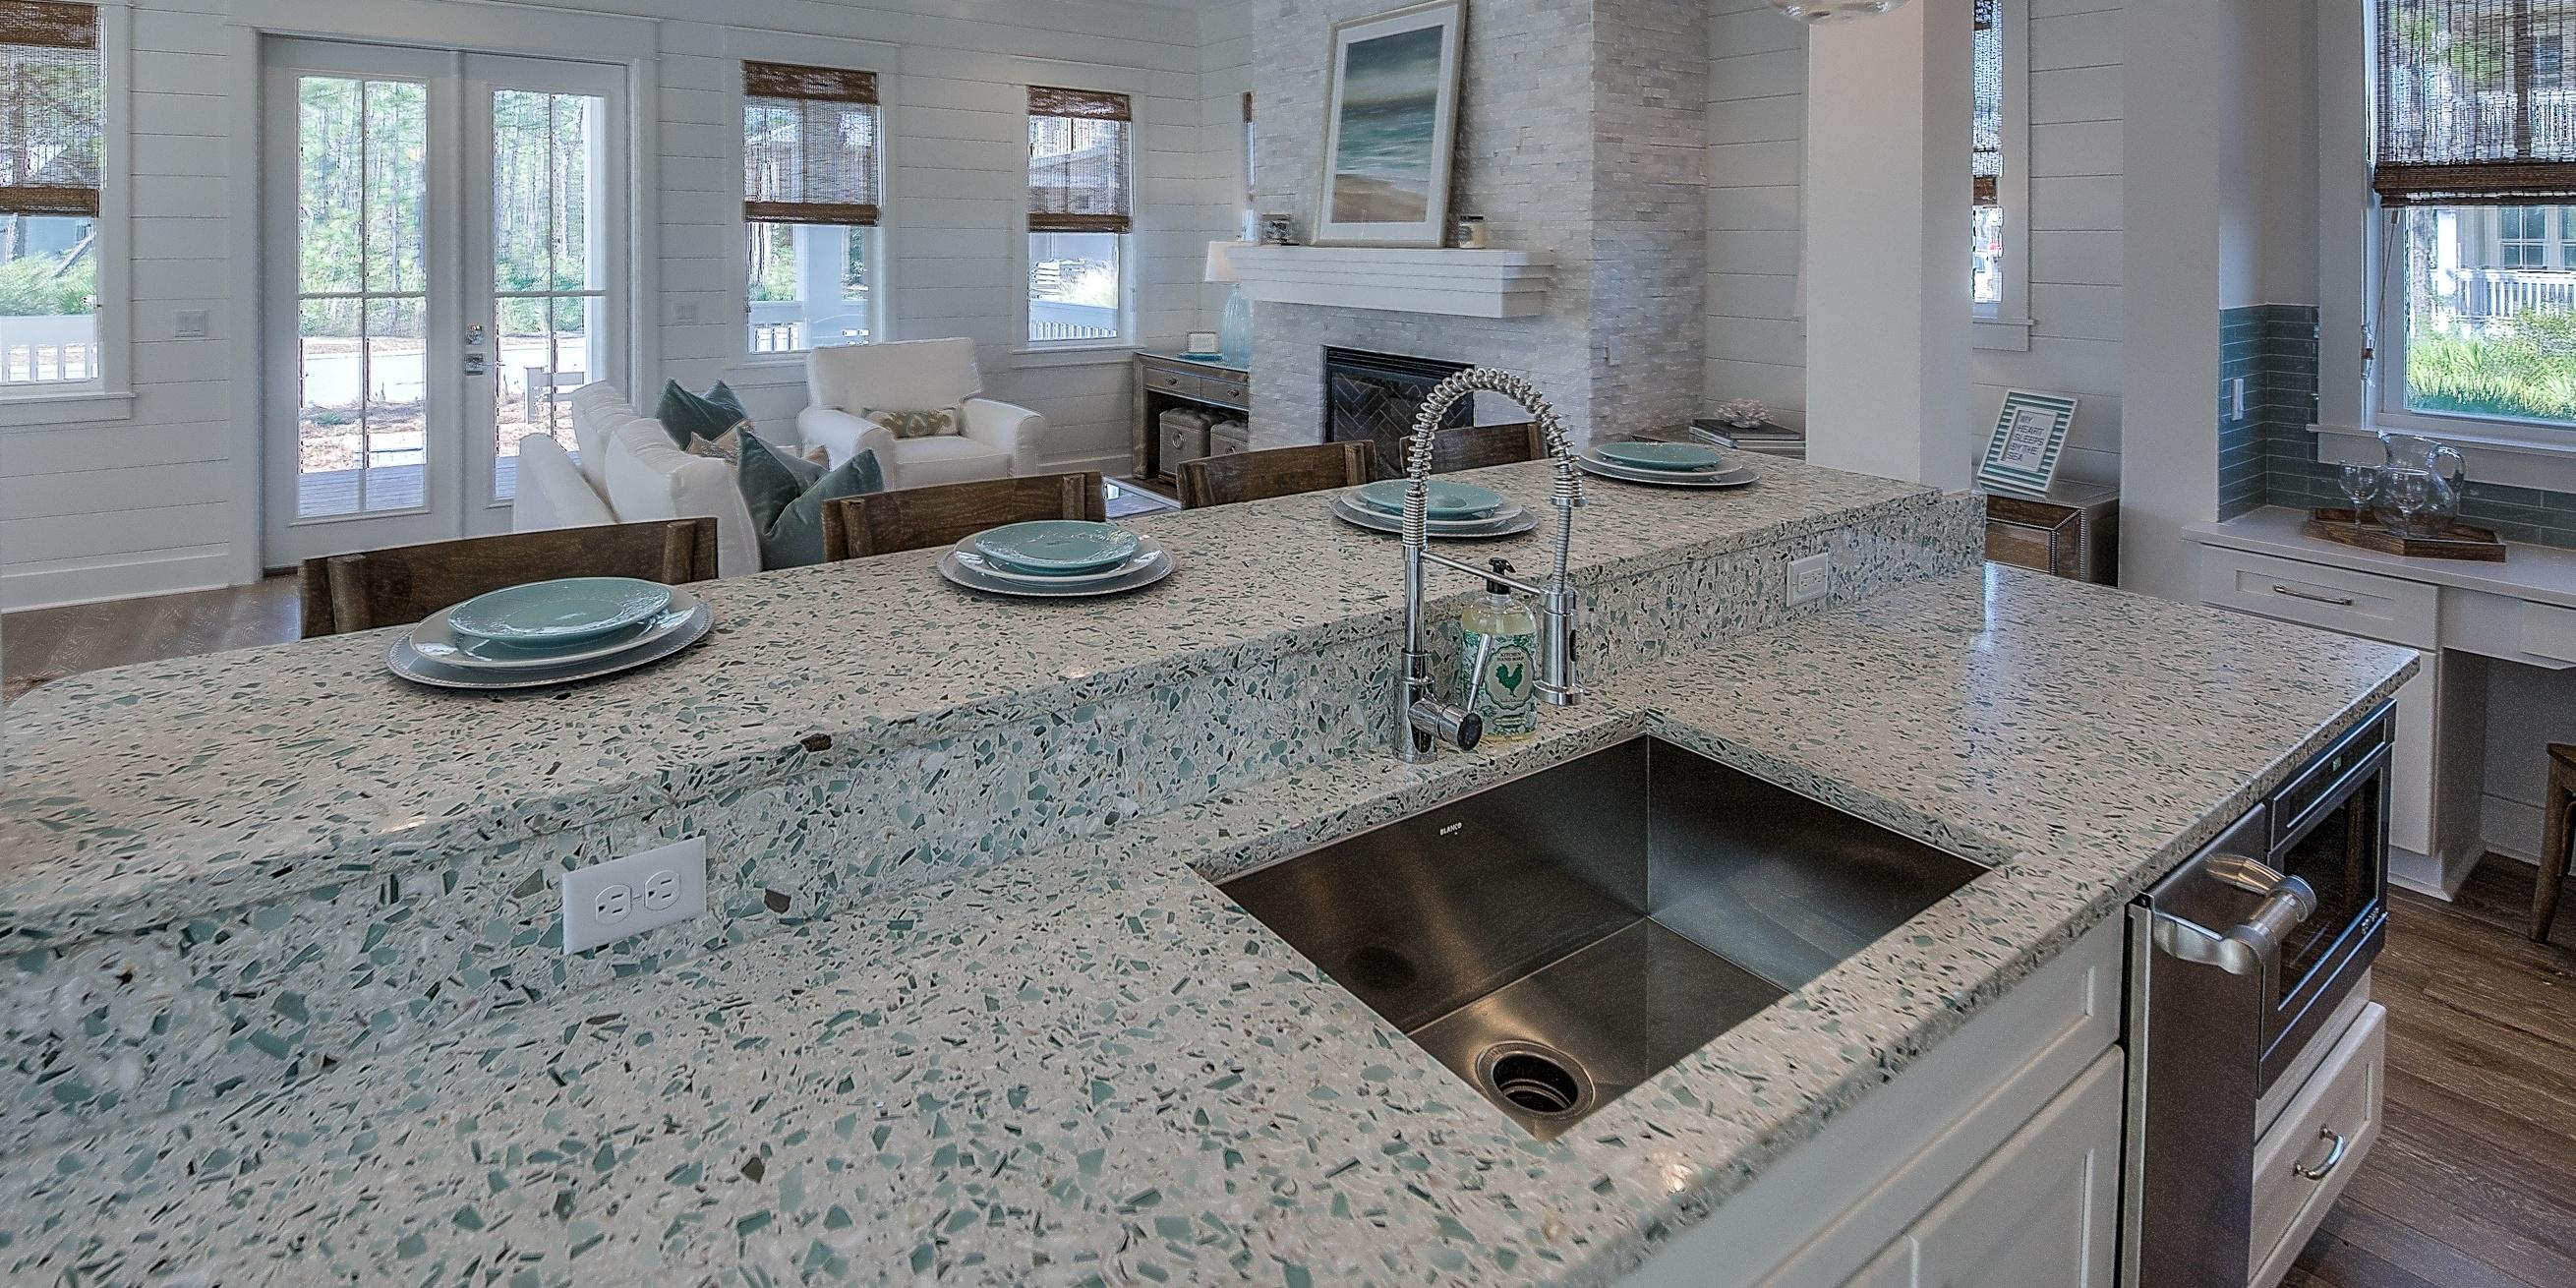 Emerald-coast-Vetrazzo-recycled-glass-kitchen-128401-edited